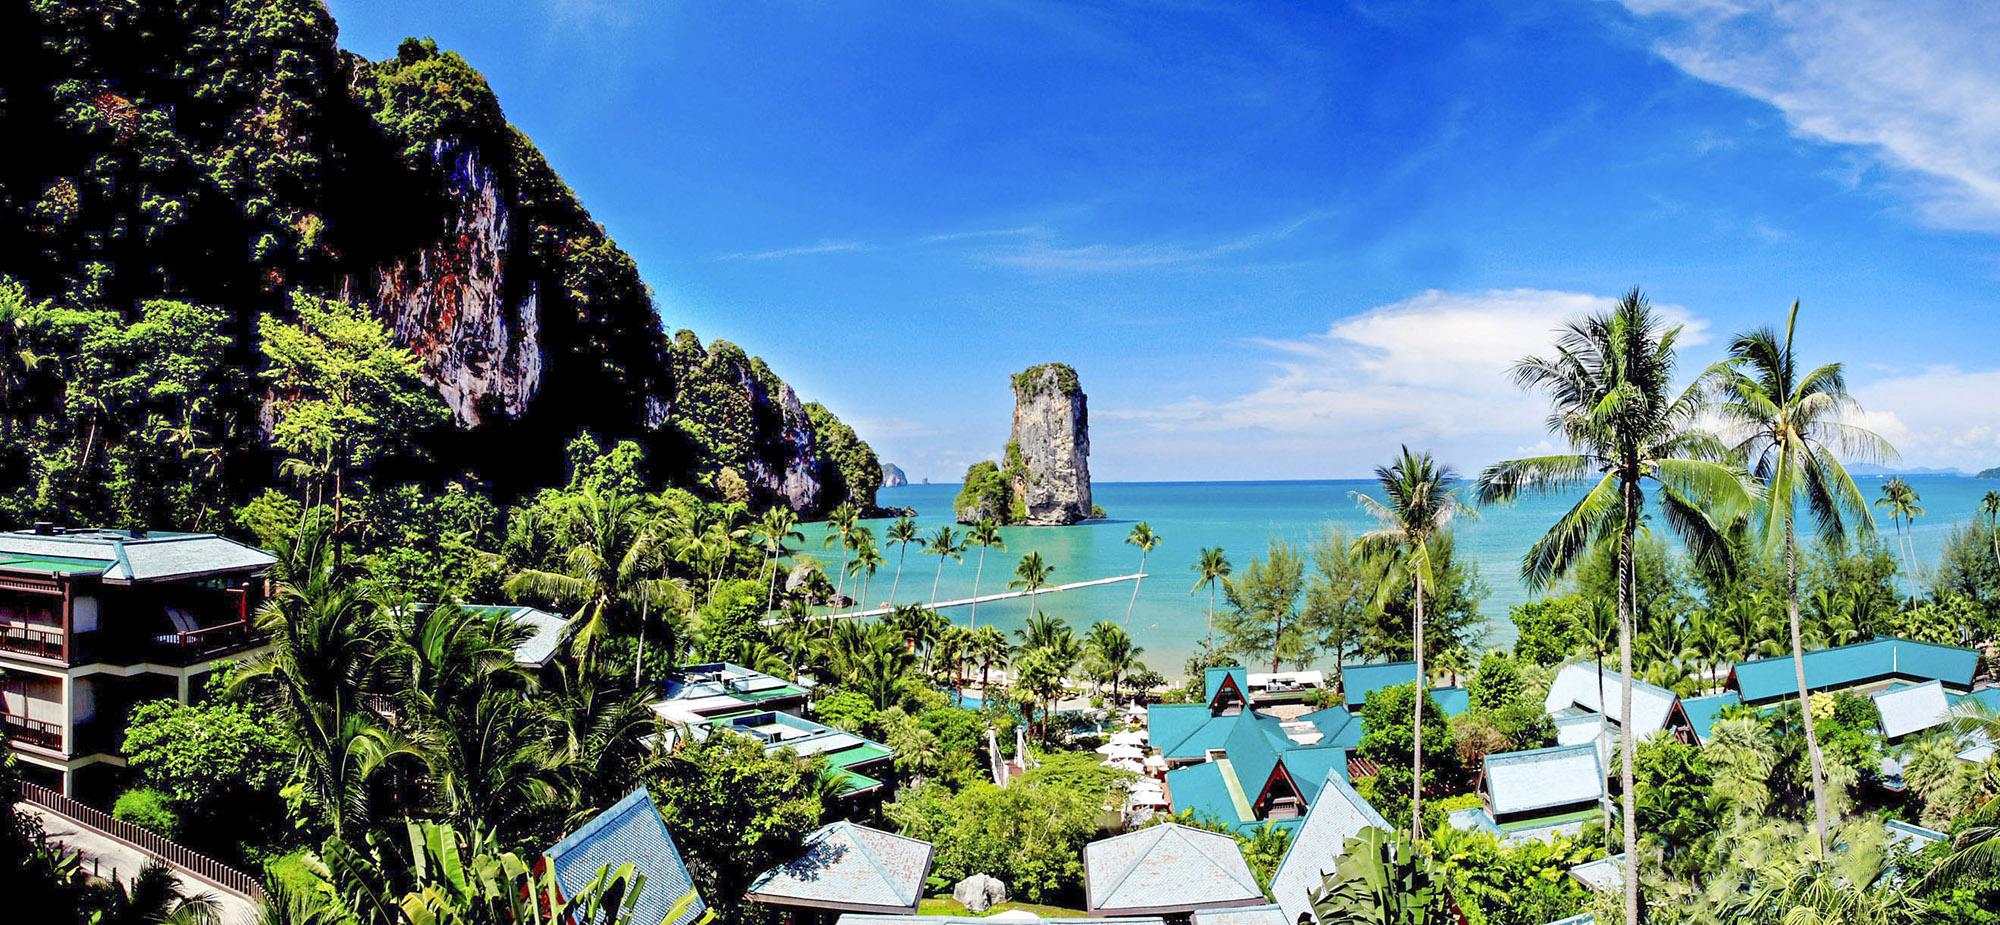 Centara Grand Beach Resort Amp Villas Krabi